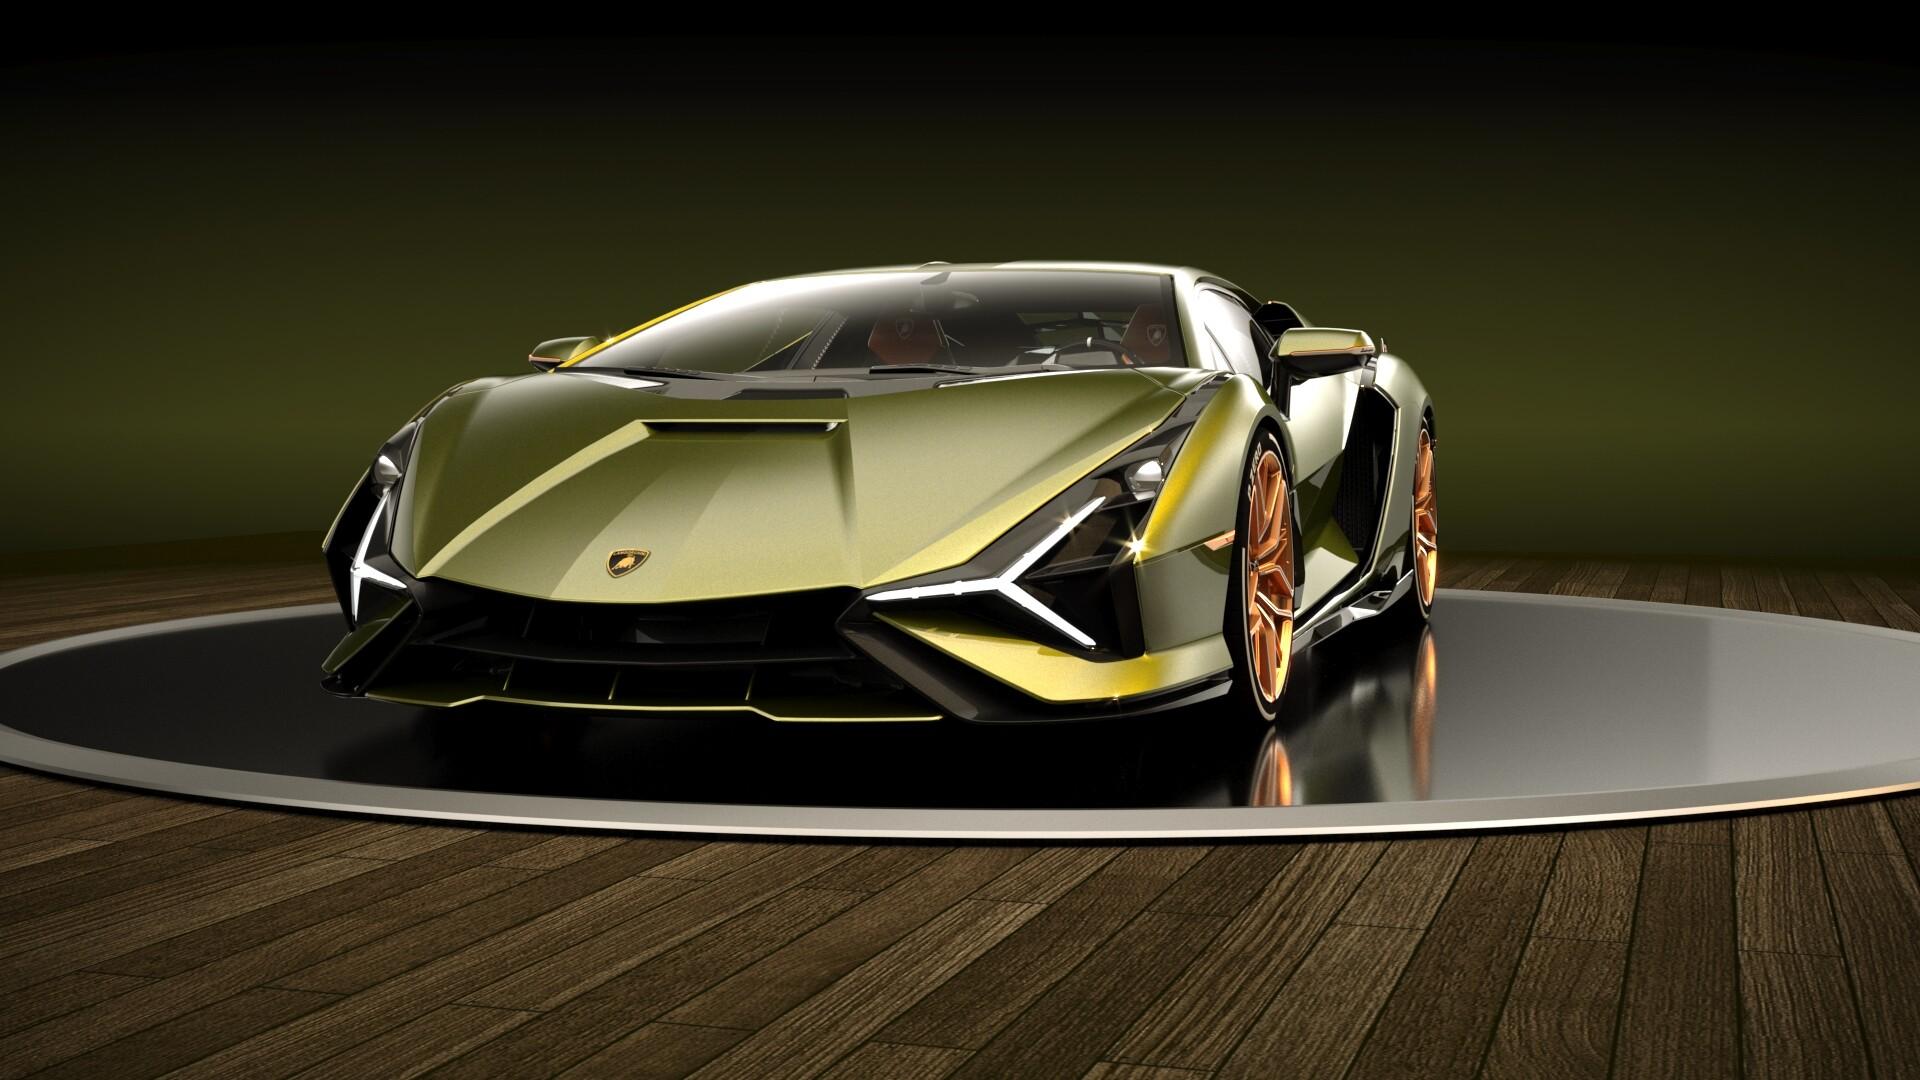 Russ Schwenkler - Lamborghini Sián FKP 37